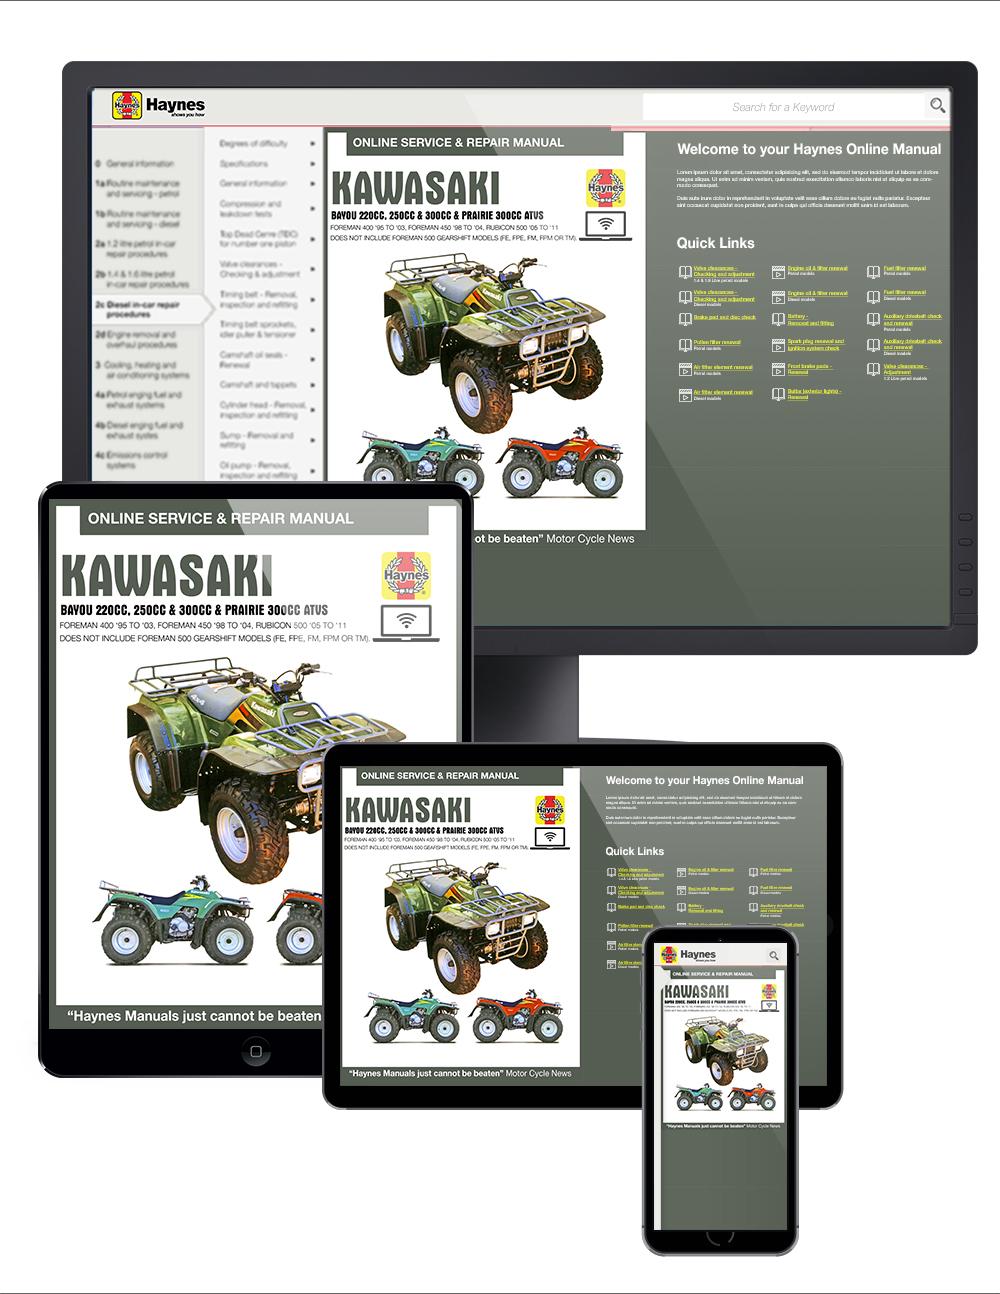 Bayou Haynes Manuals Kawasaki Kvf300 Wiring Diagram Online Manual Enlarge